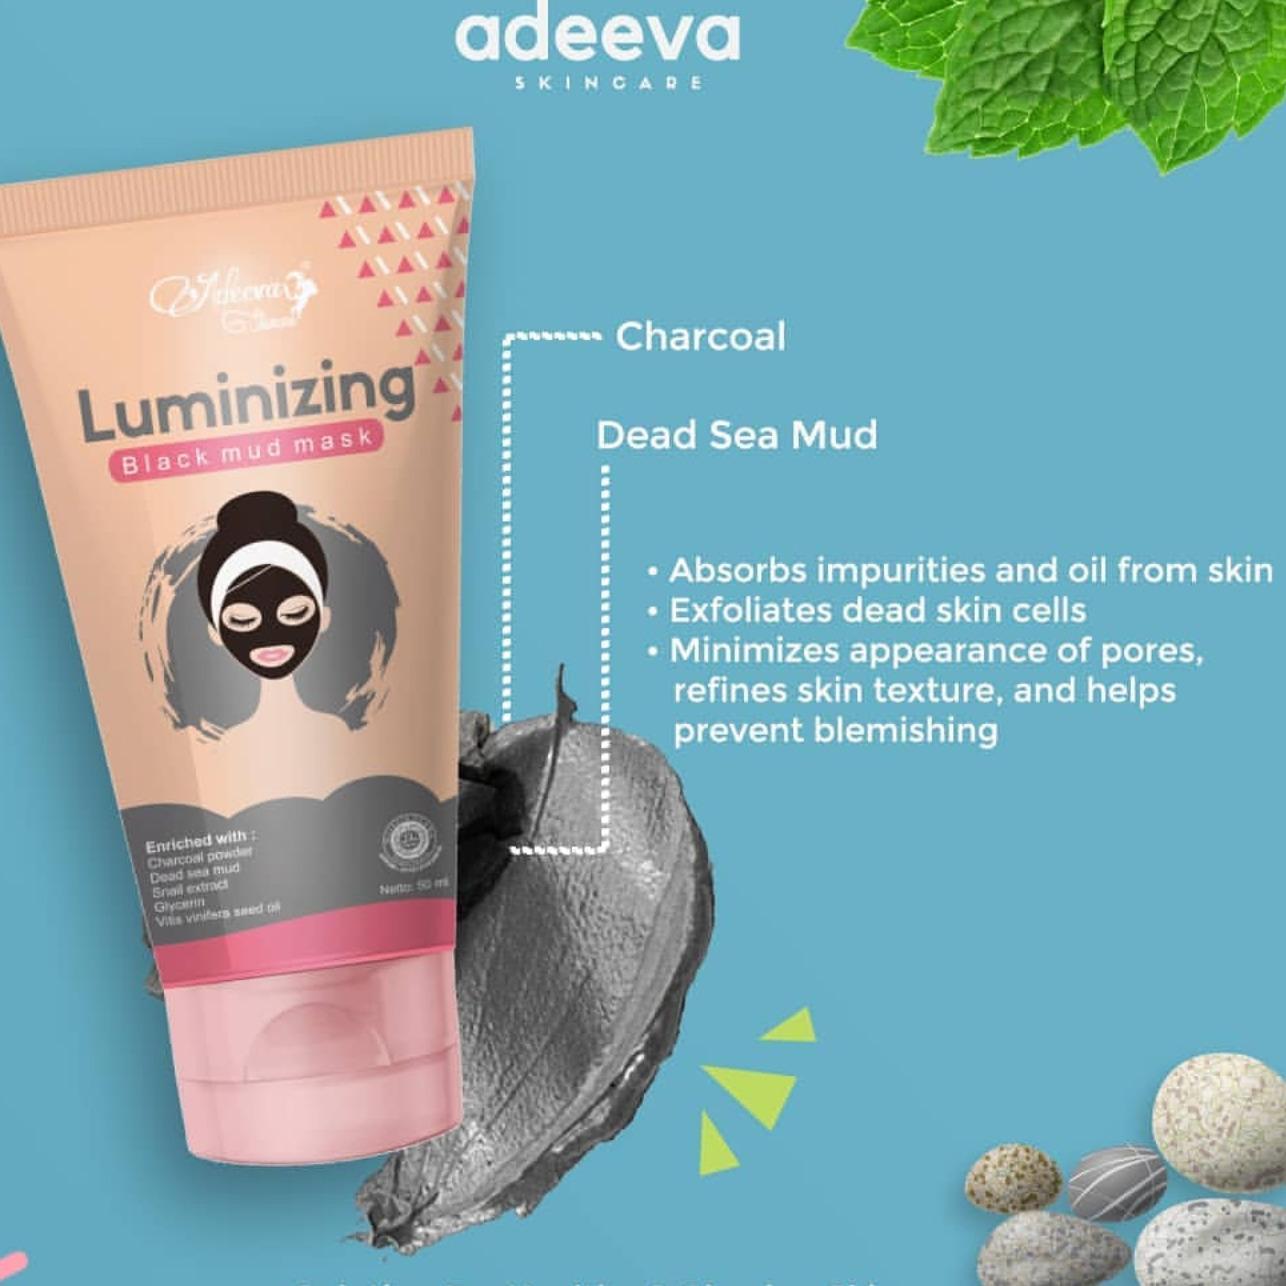 Adeeva Skincare Luminizing Black Mud Mask Masker Hitam (1 Pcs)